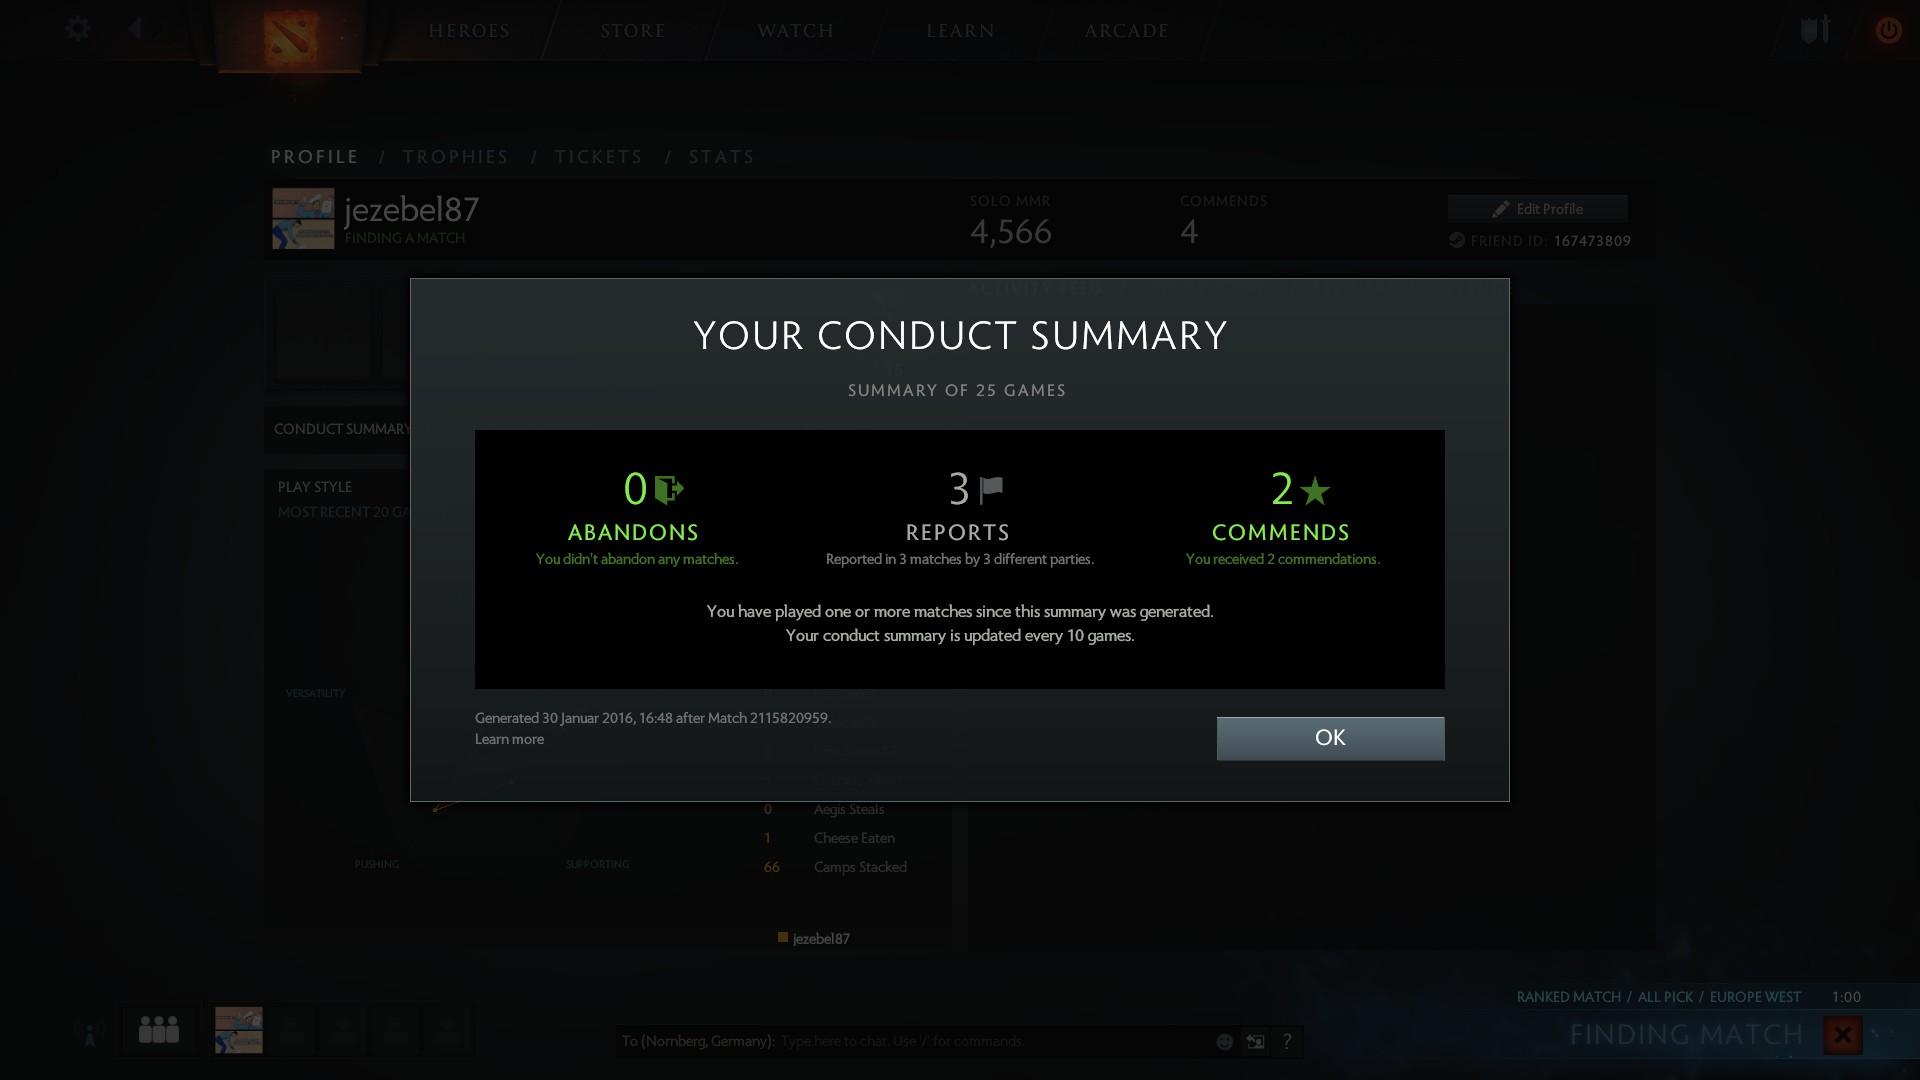 General Discussion Playerbehaviorscorelastreport